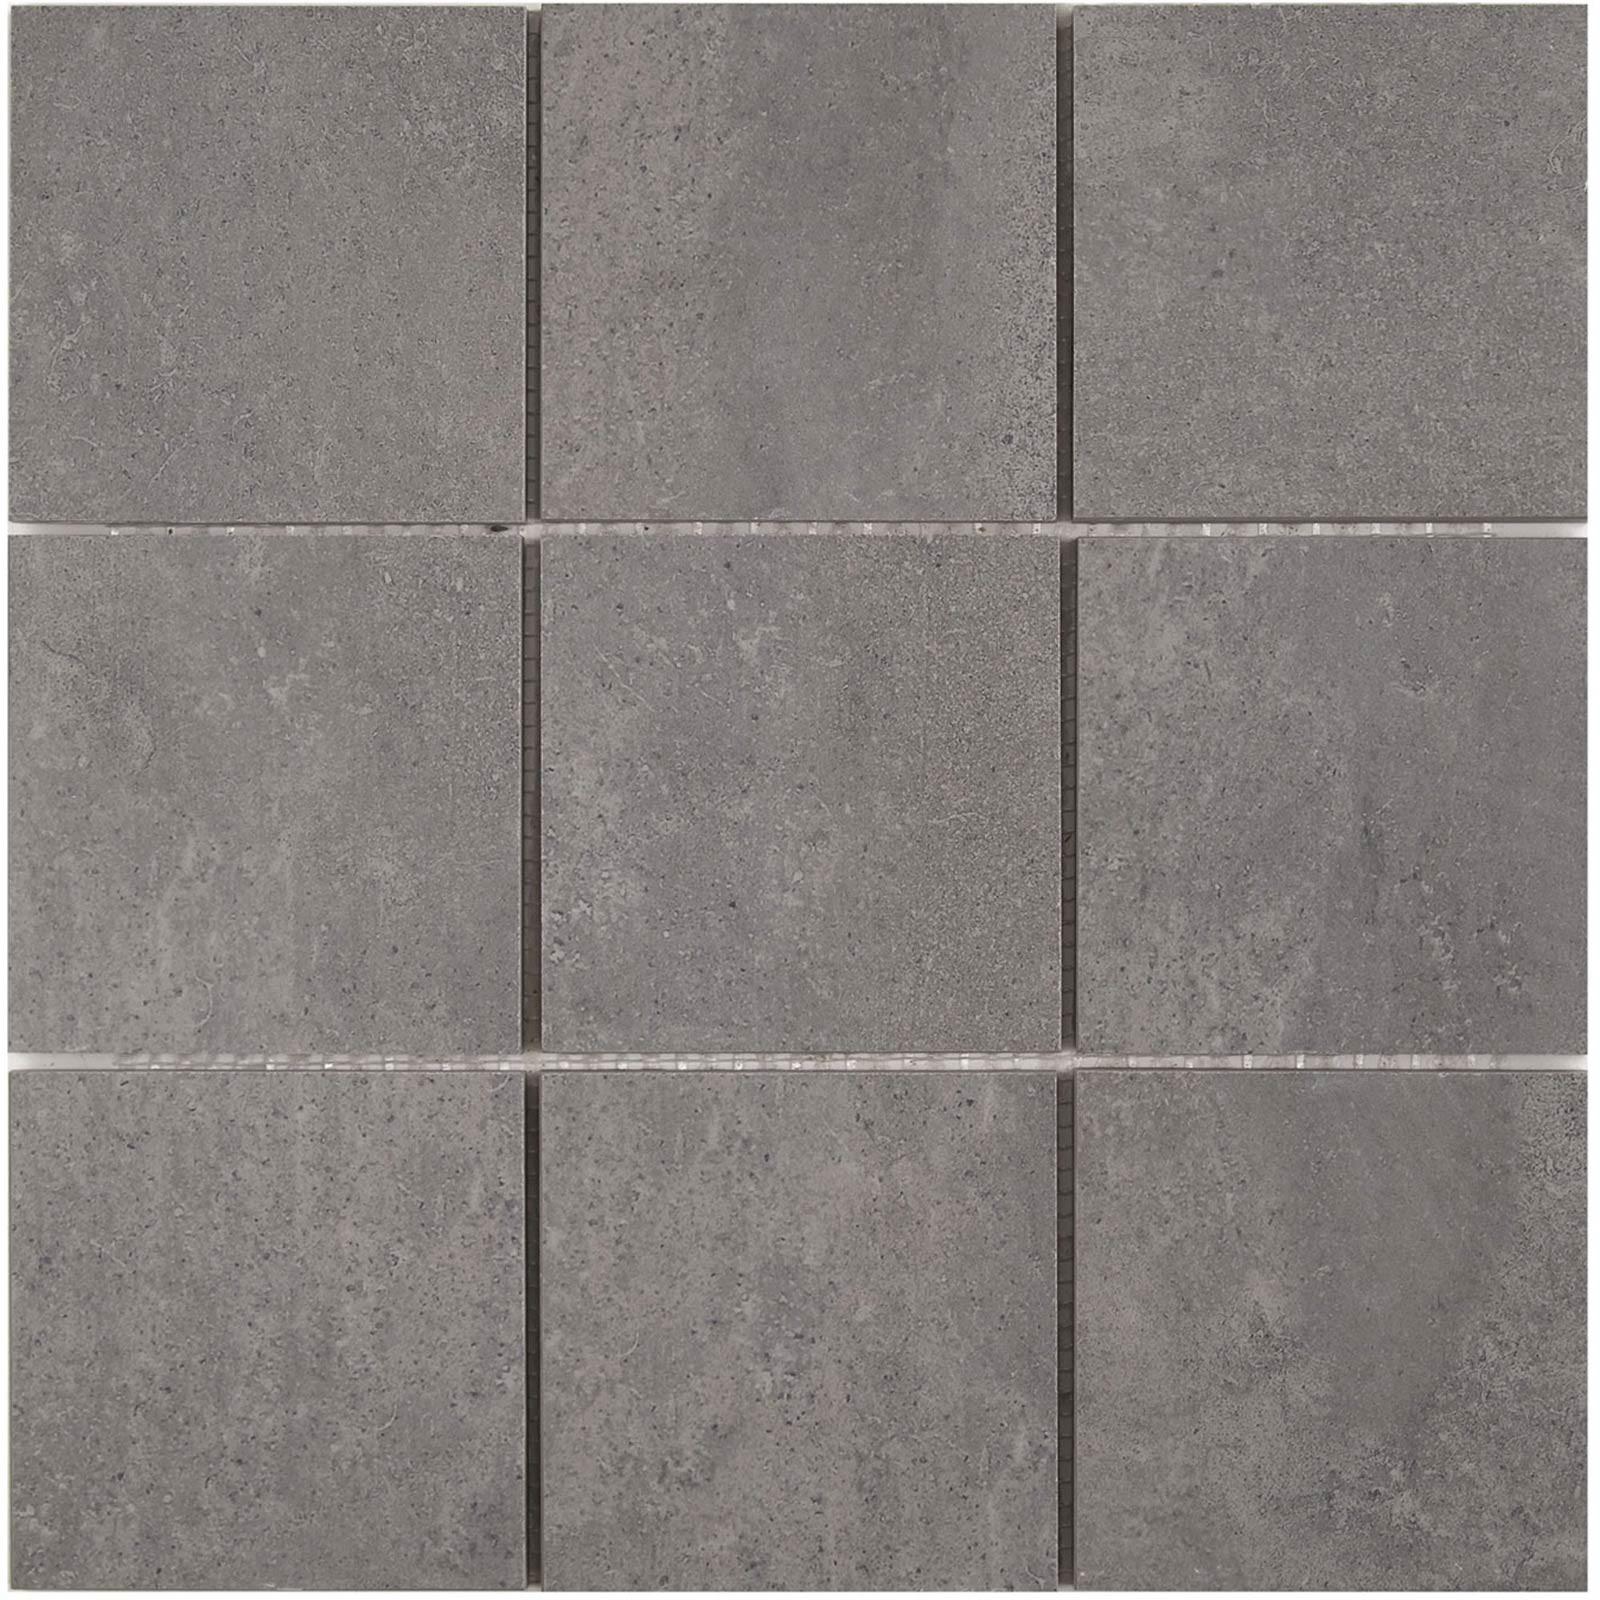 Cementi dark grey porcelain wall floor mosaic for 10x10 ceramic floor tile